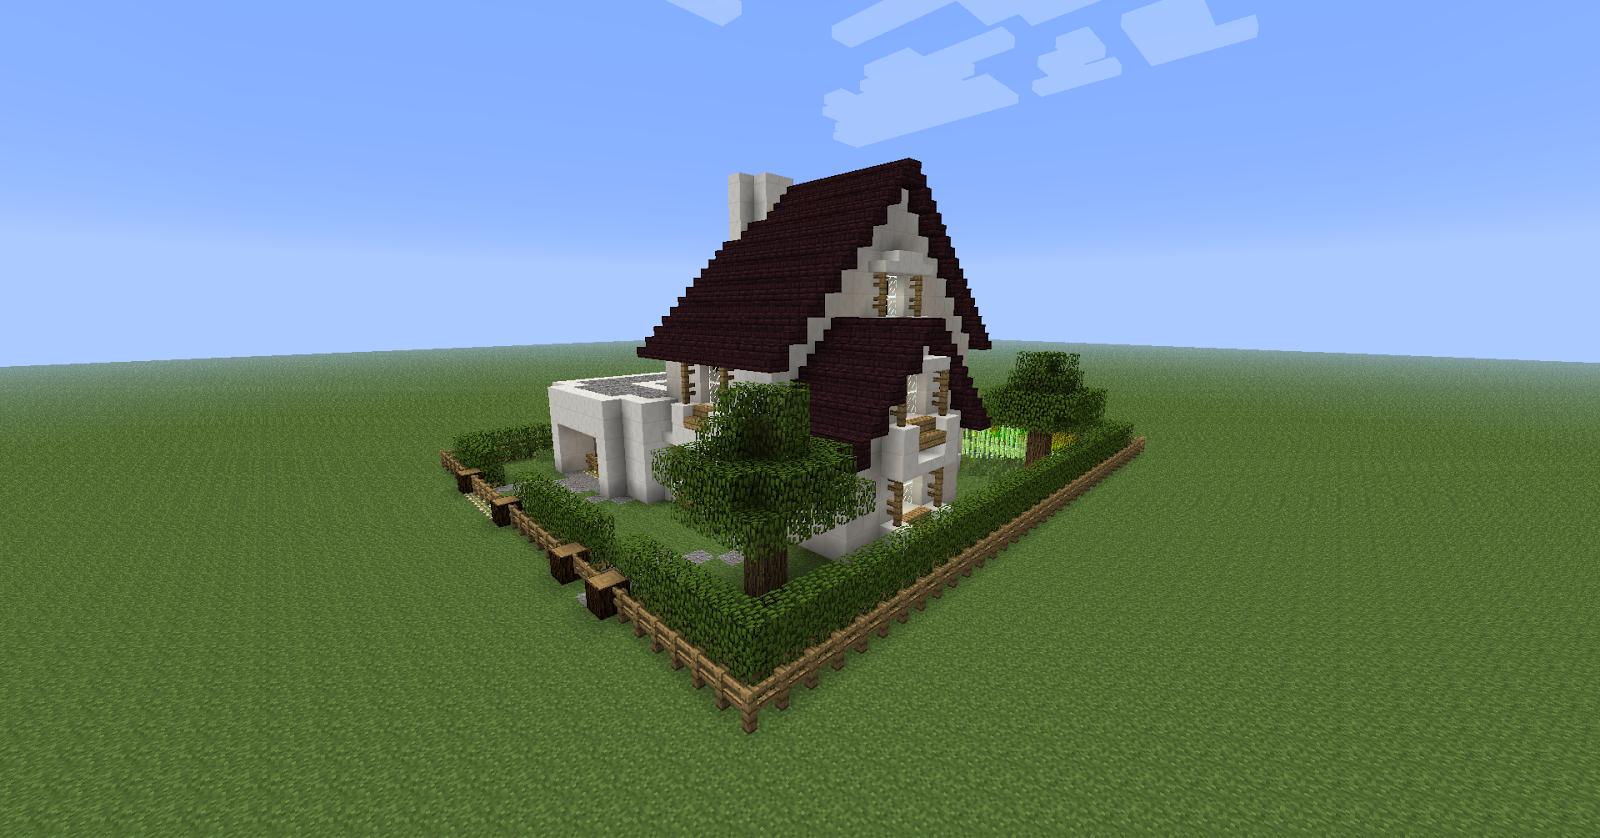 Chambre Moderne Minecraft : Petite Maison Minecraft